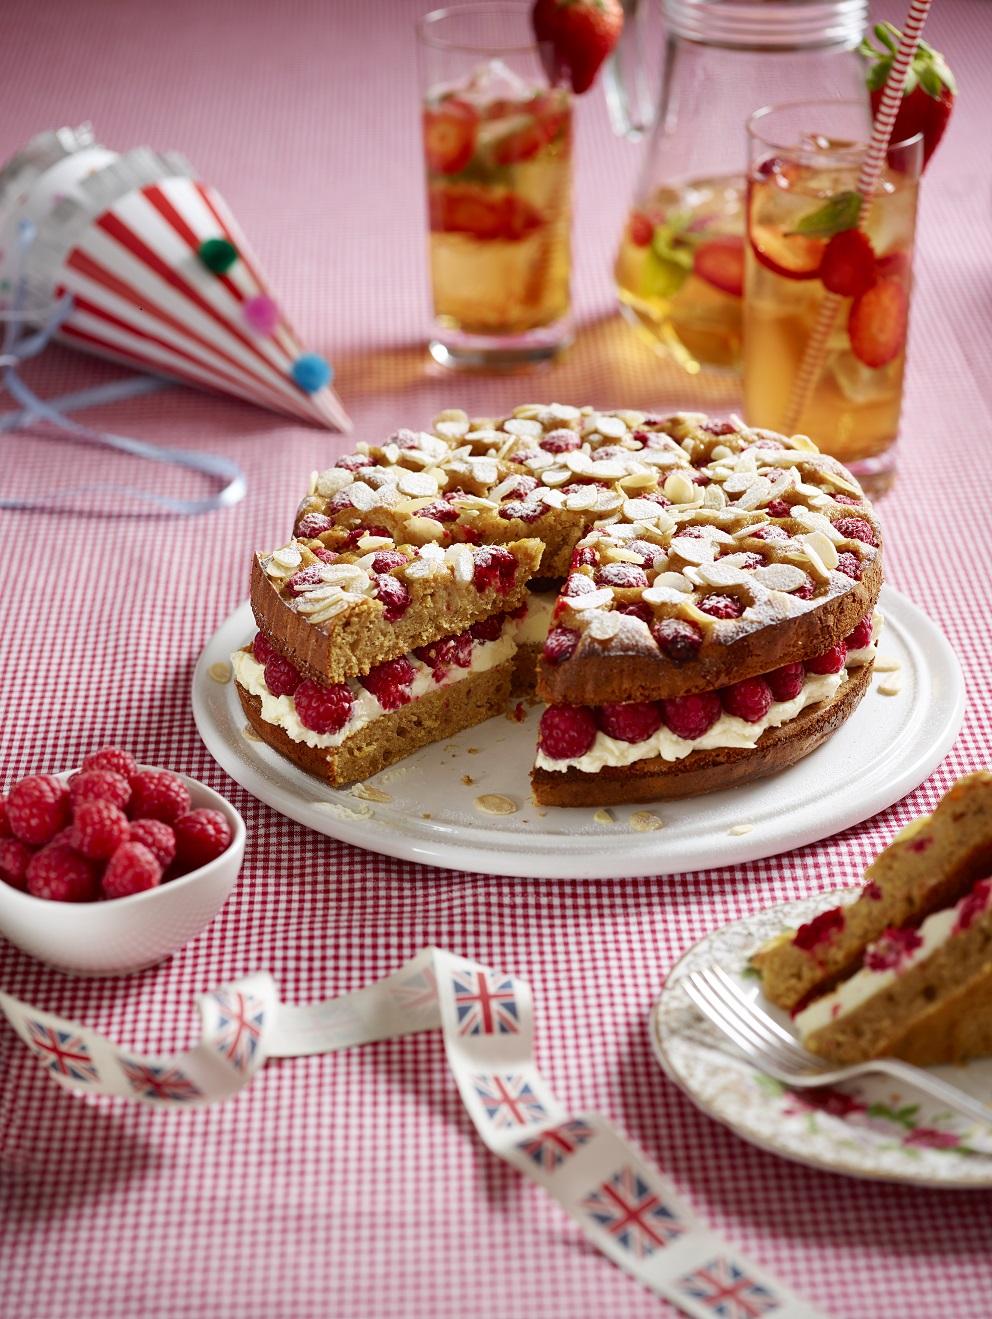 Potter's British Raspberry, Apricot And Almond Cake